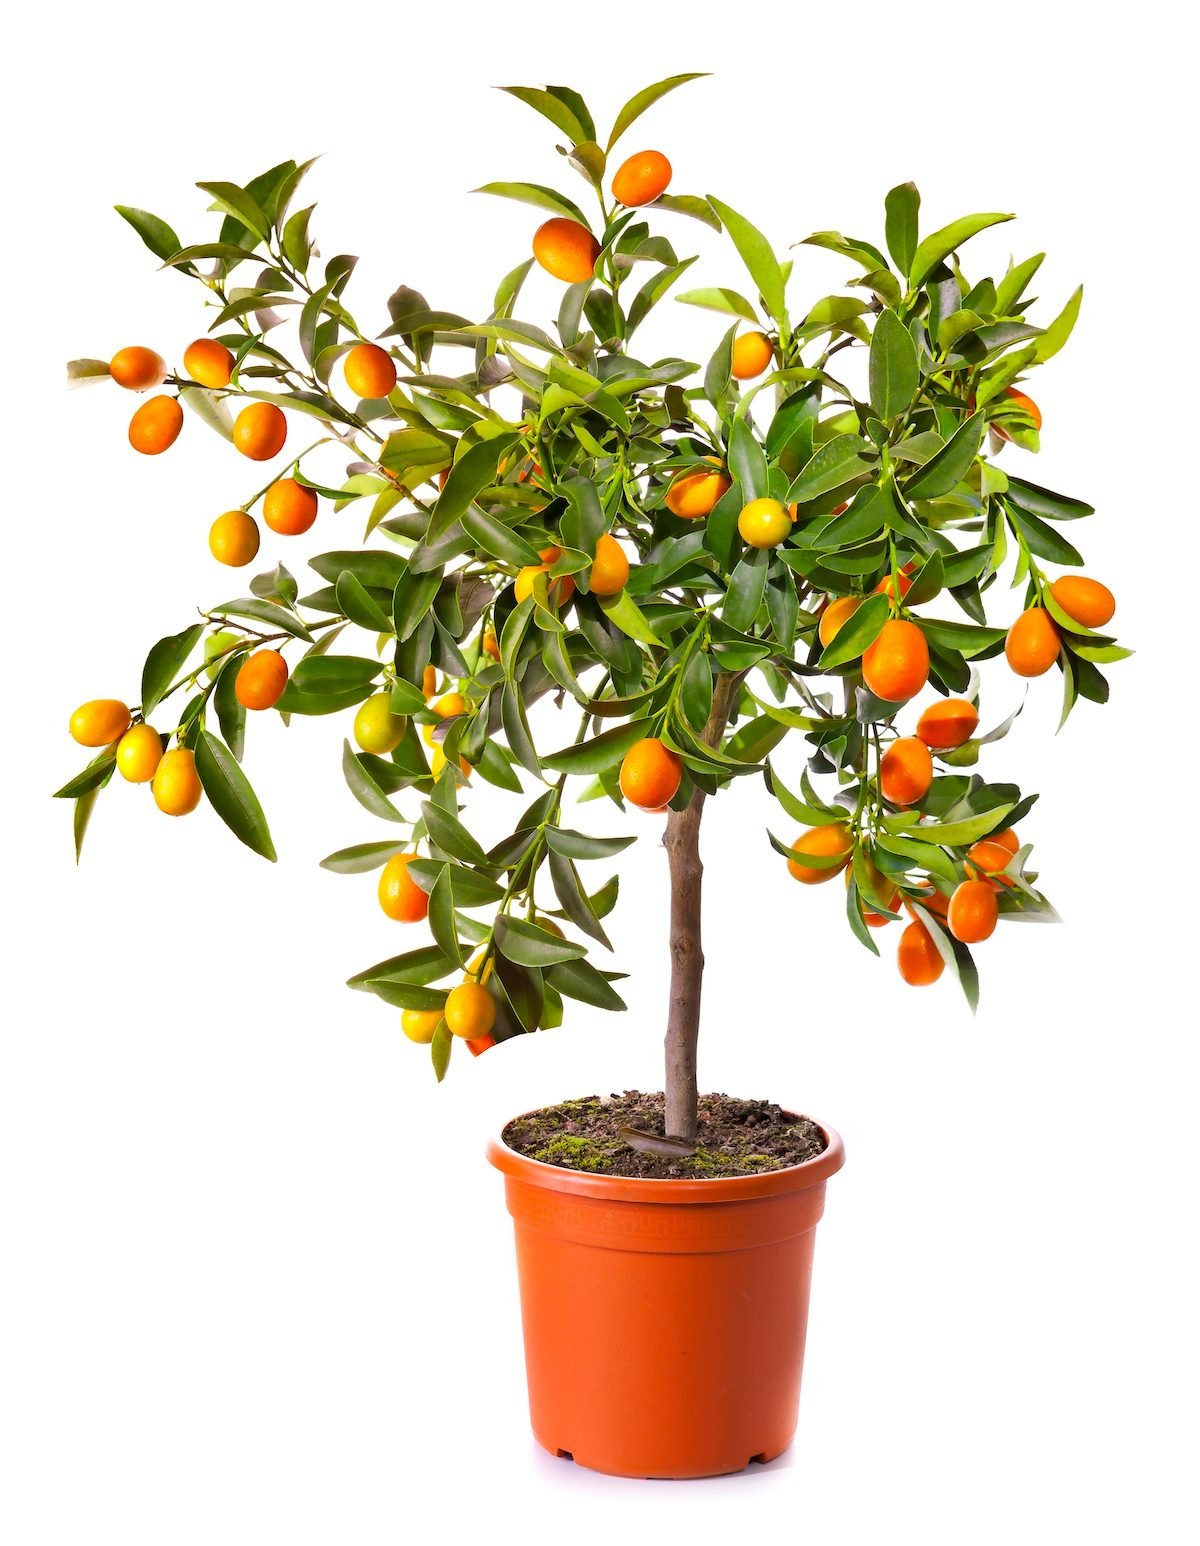 Lemon tree plant gifts